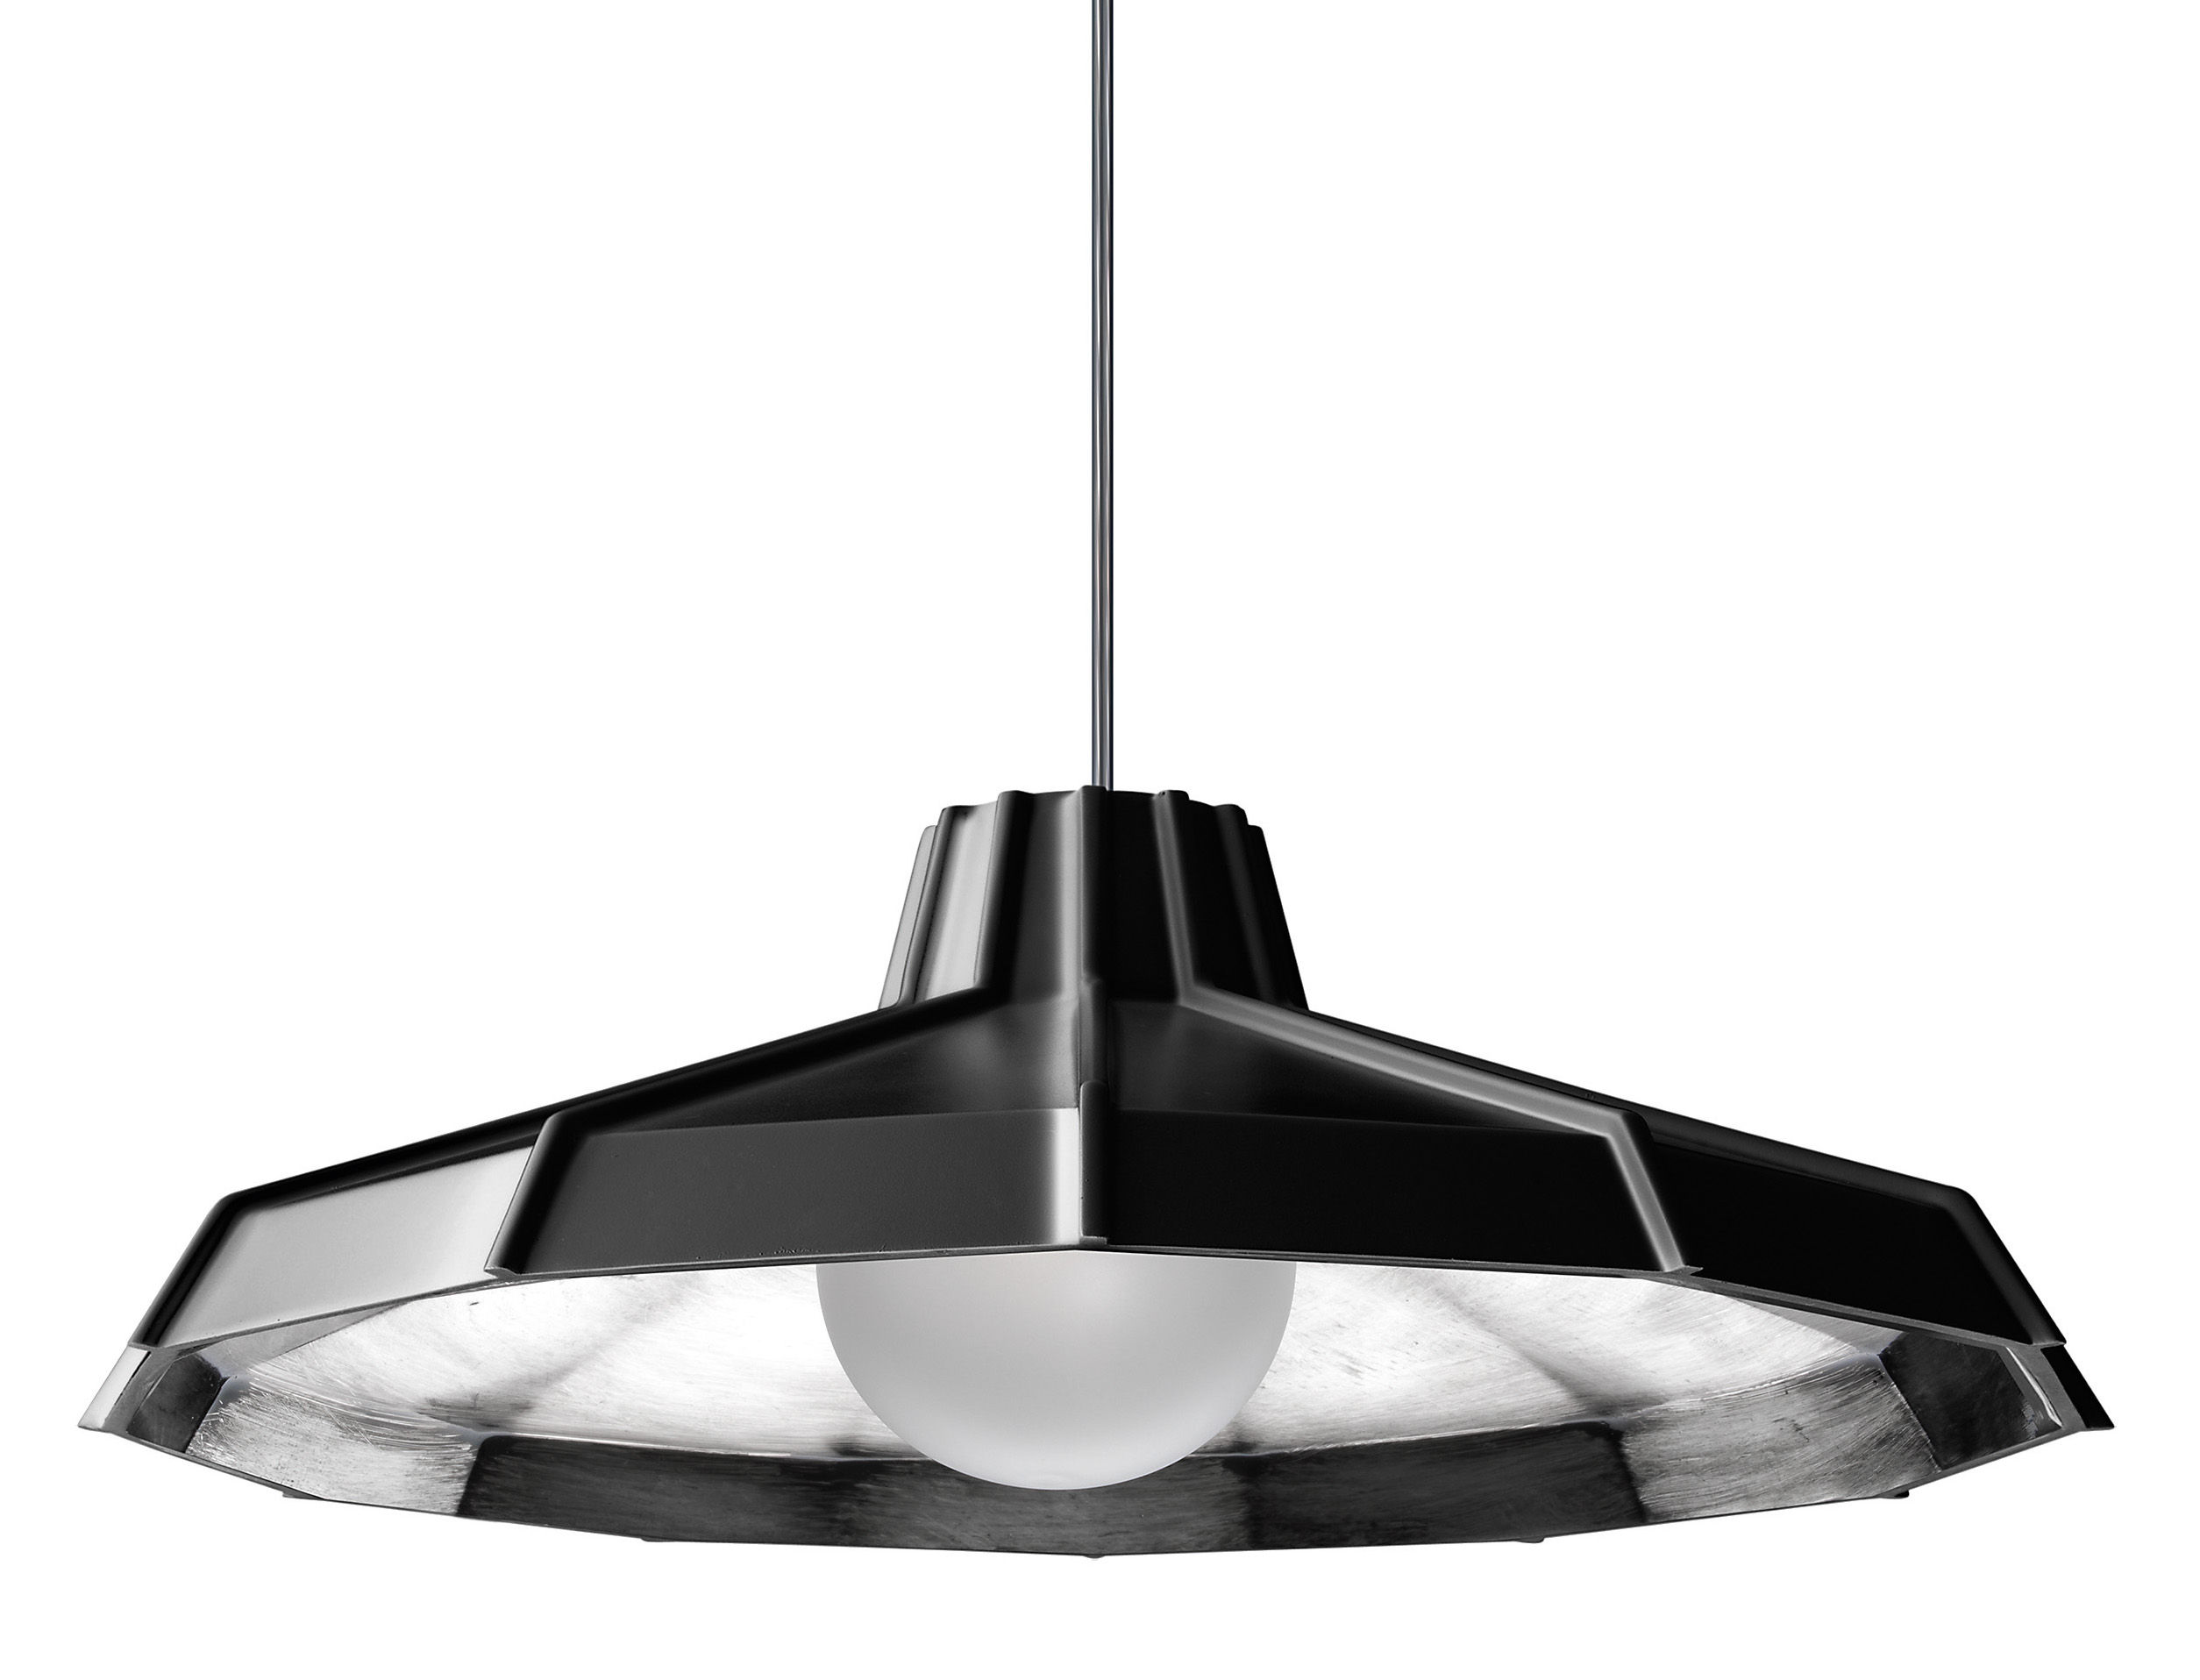 Lighting - Pendant Lighting - Mysterio Pendant - Ø 31 cm by Diesel with Foscarini - Black / Silver - Polycarbonate